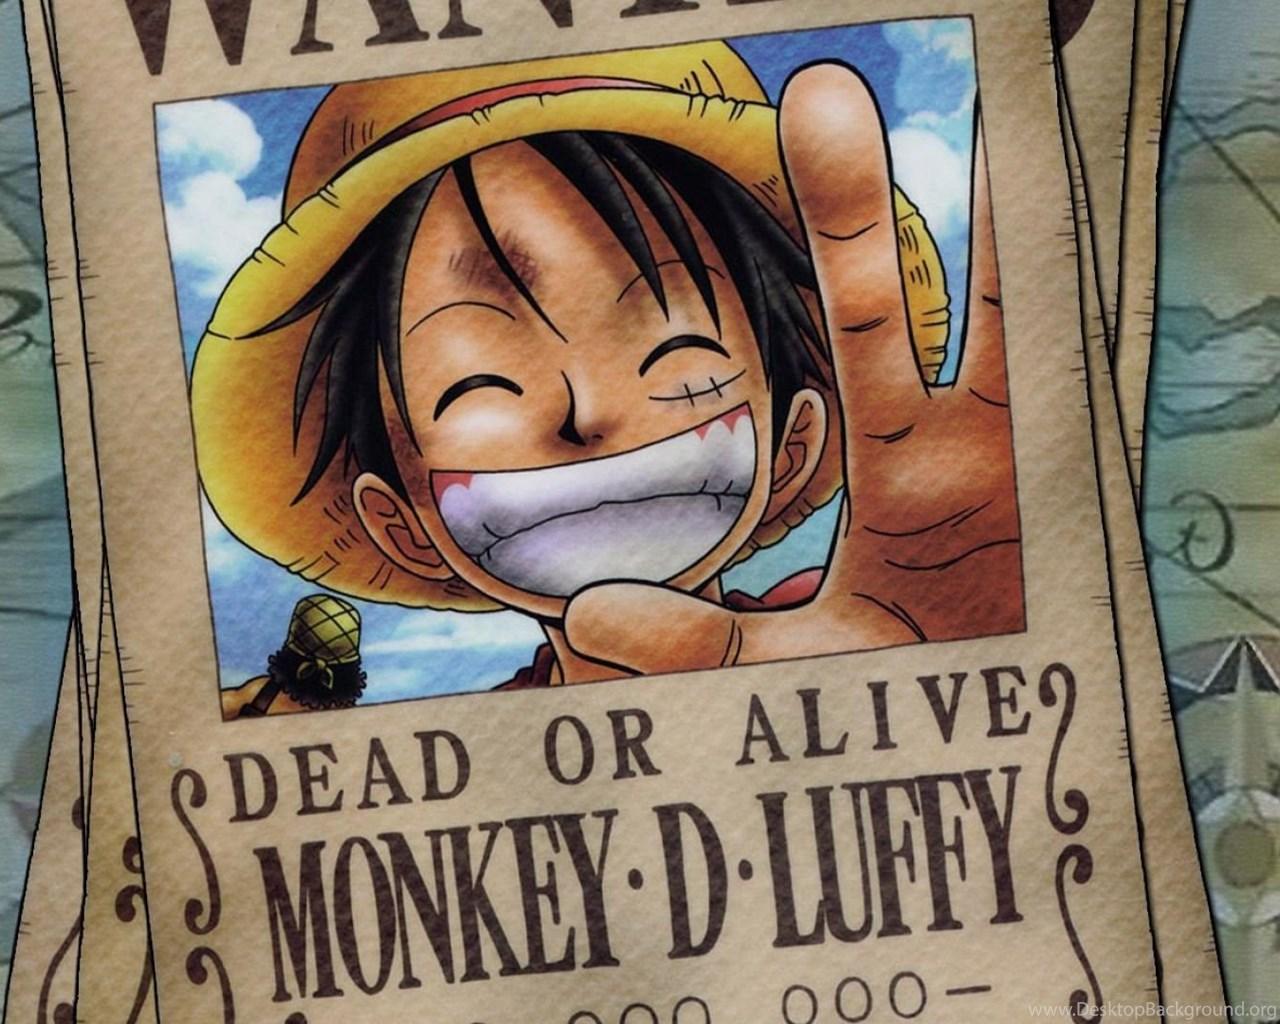 Iphone One Piece Luffy Gear 4 Wallpaper Hd Doraemon